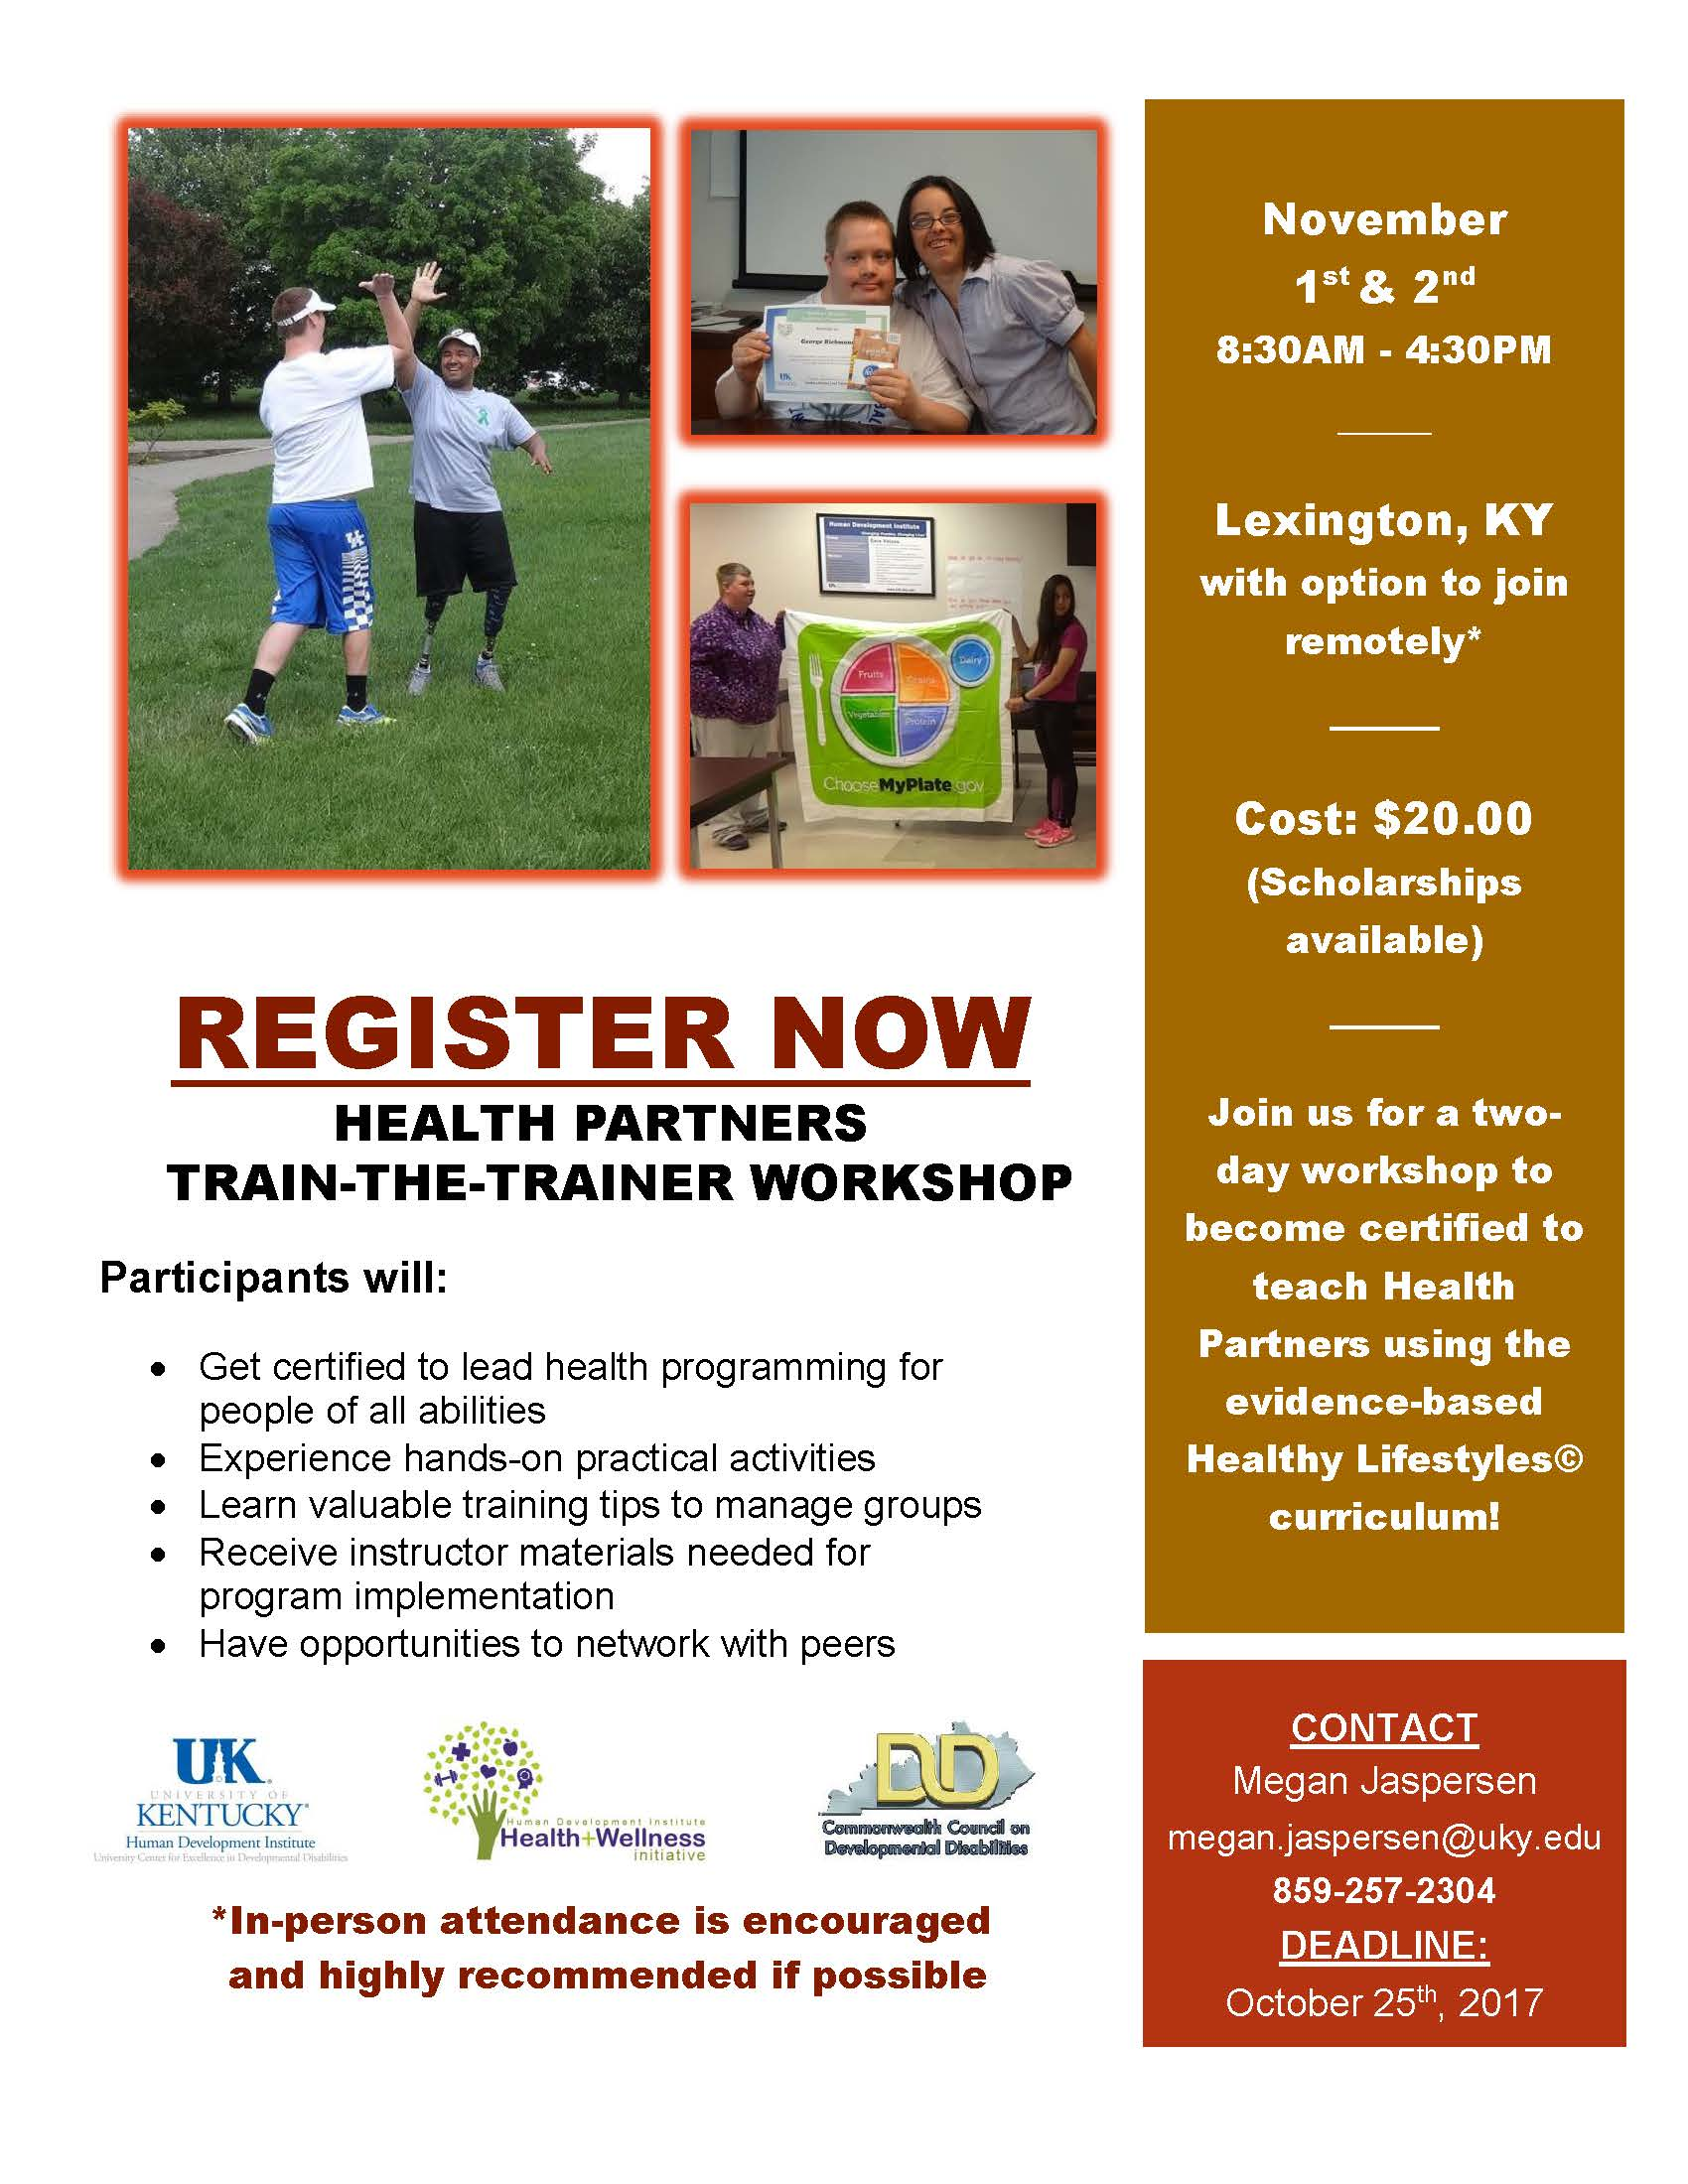 Health Partners training workshop flyer